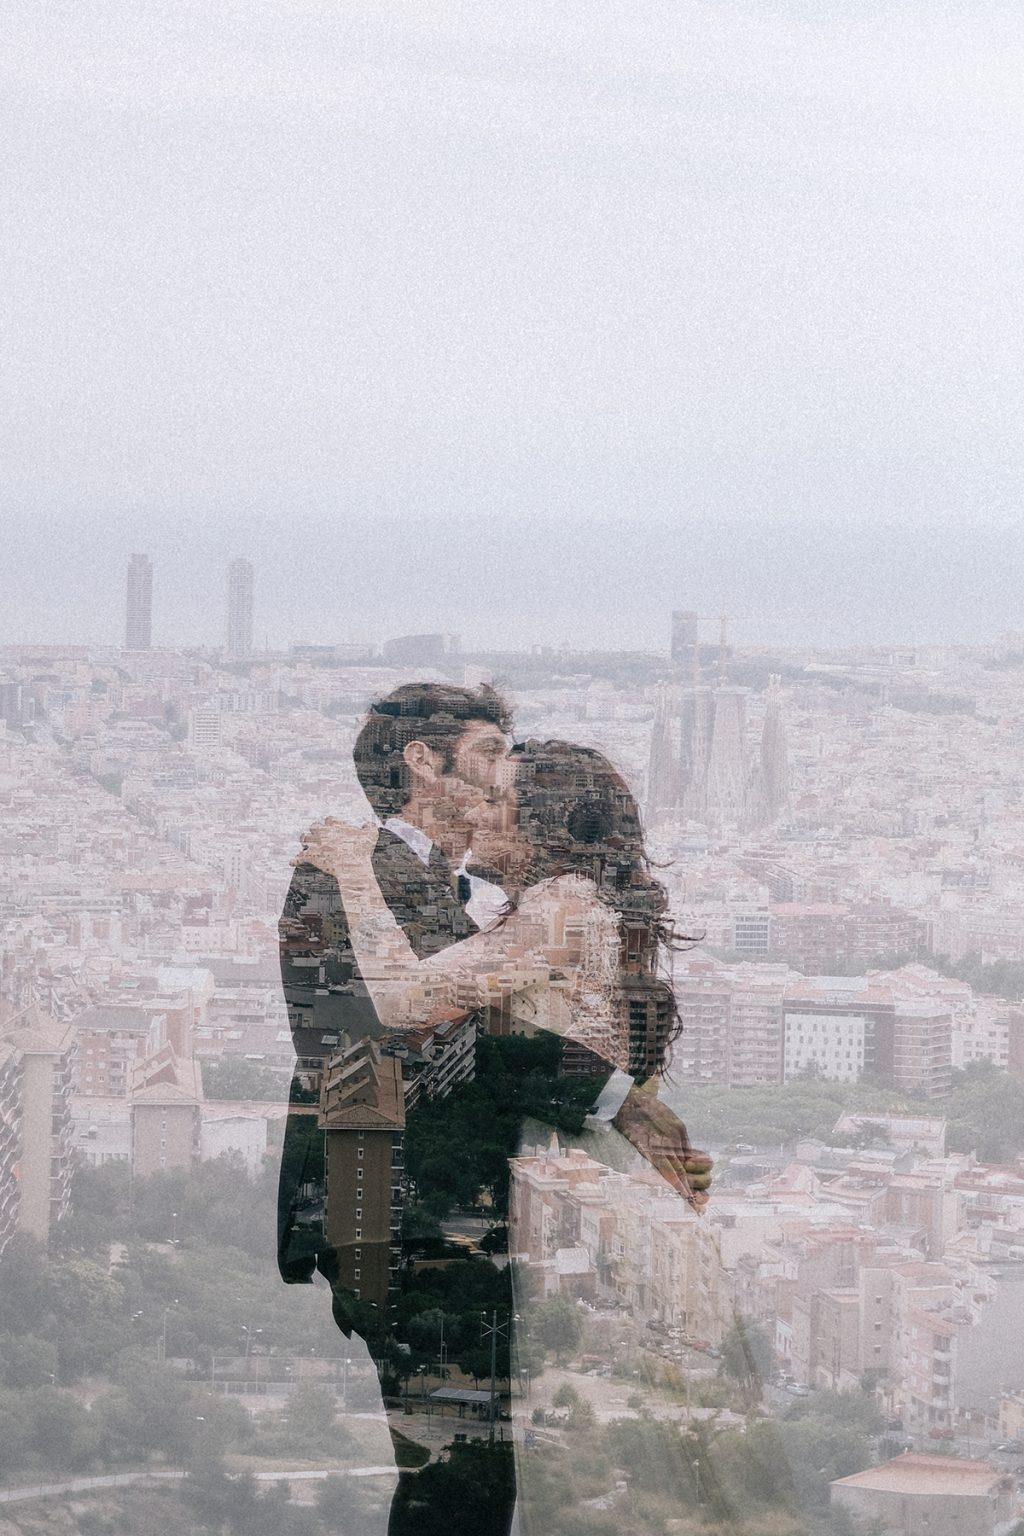 The Love and Roll fotógrafo de bodas en Barcelona